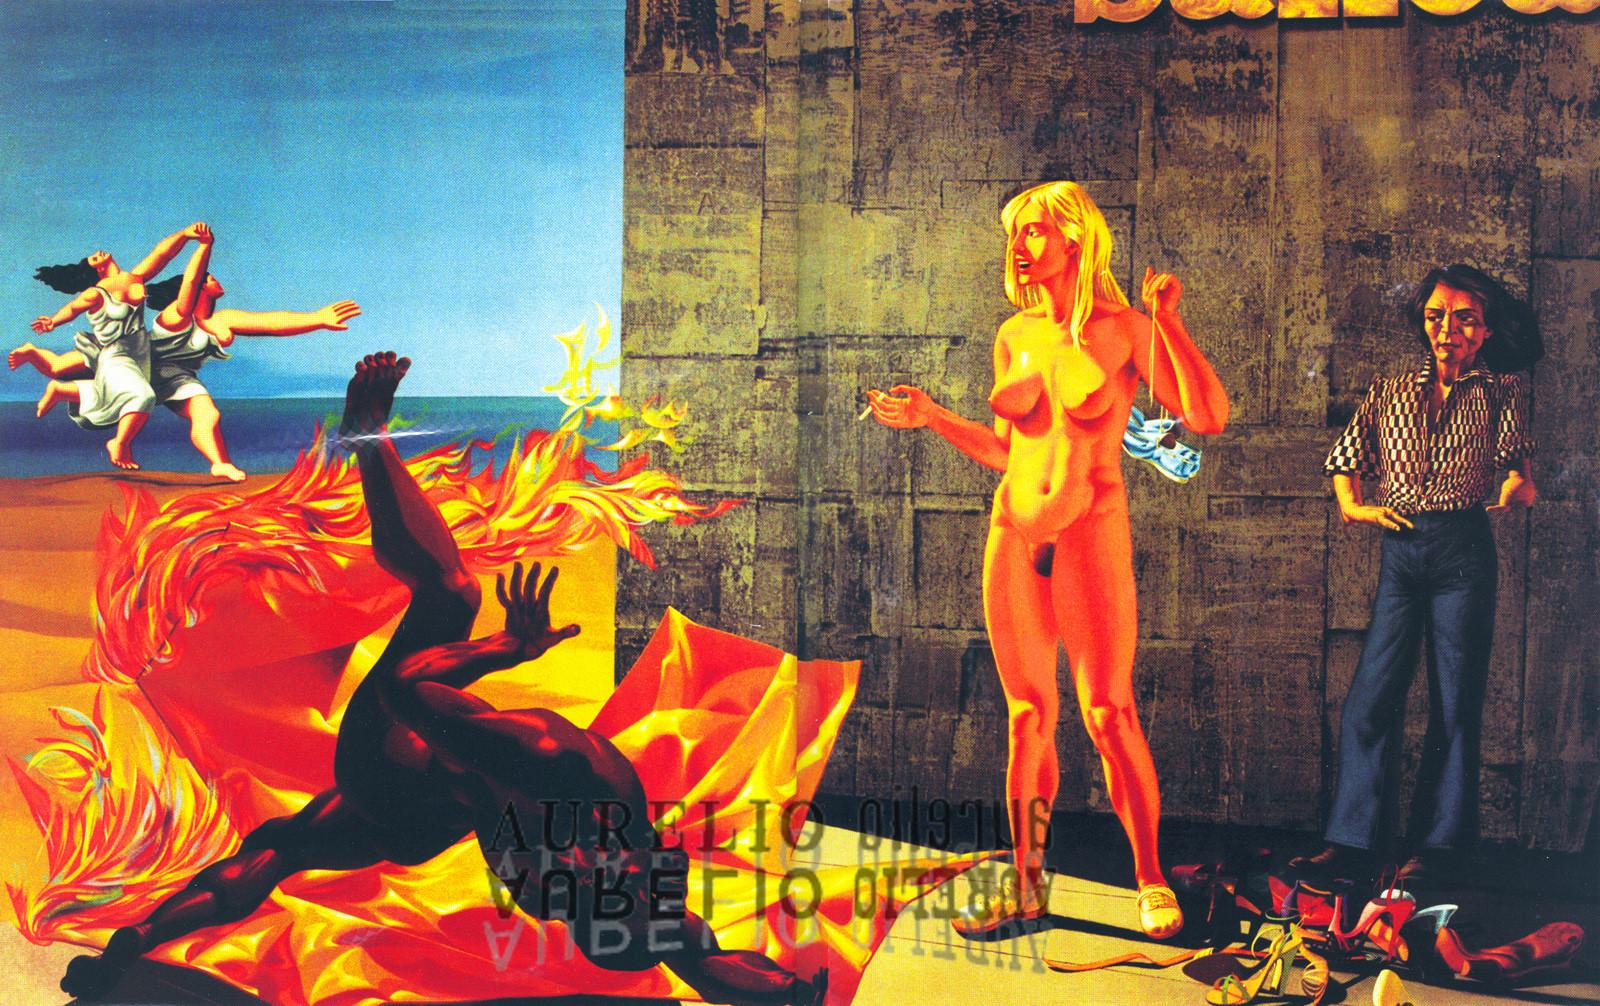 Aurelio C. - Apologia della razza - 1977